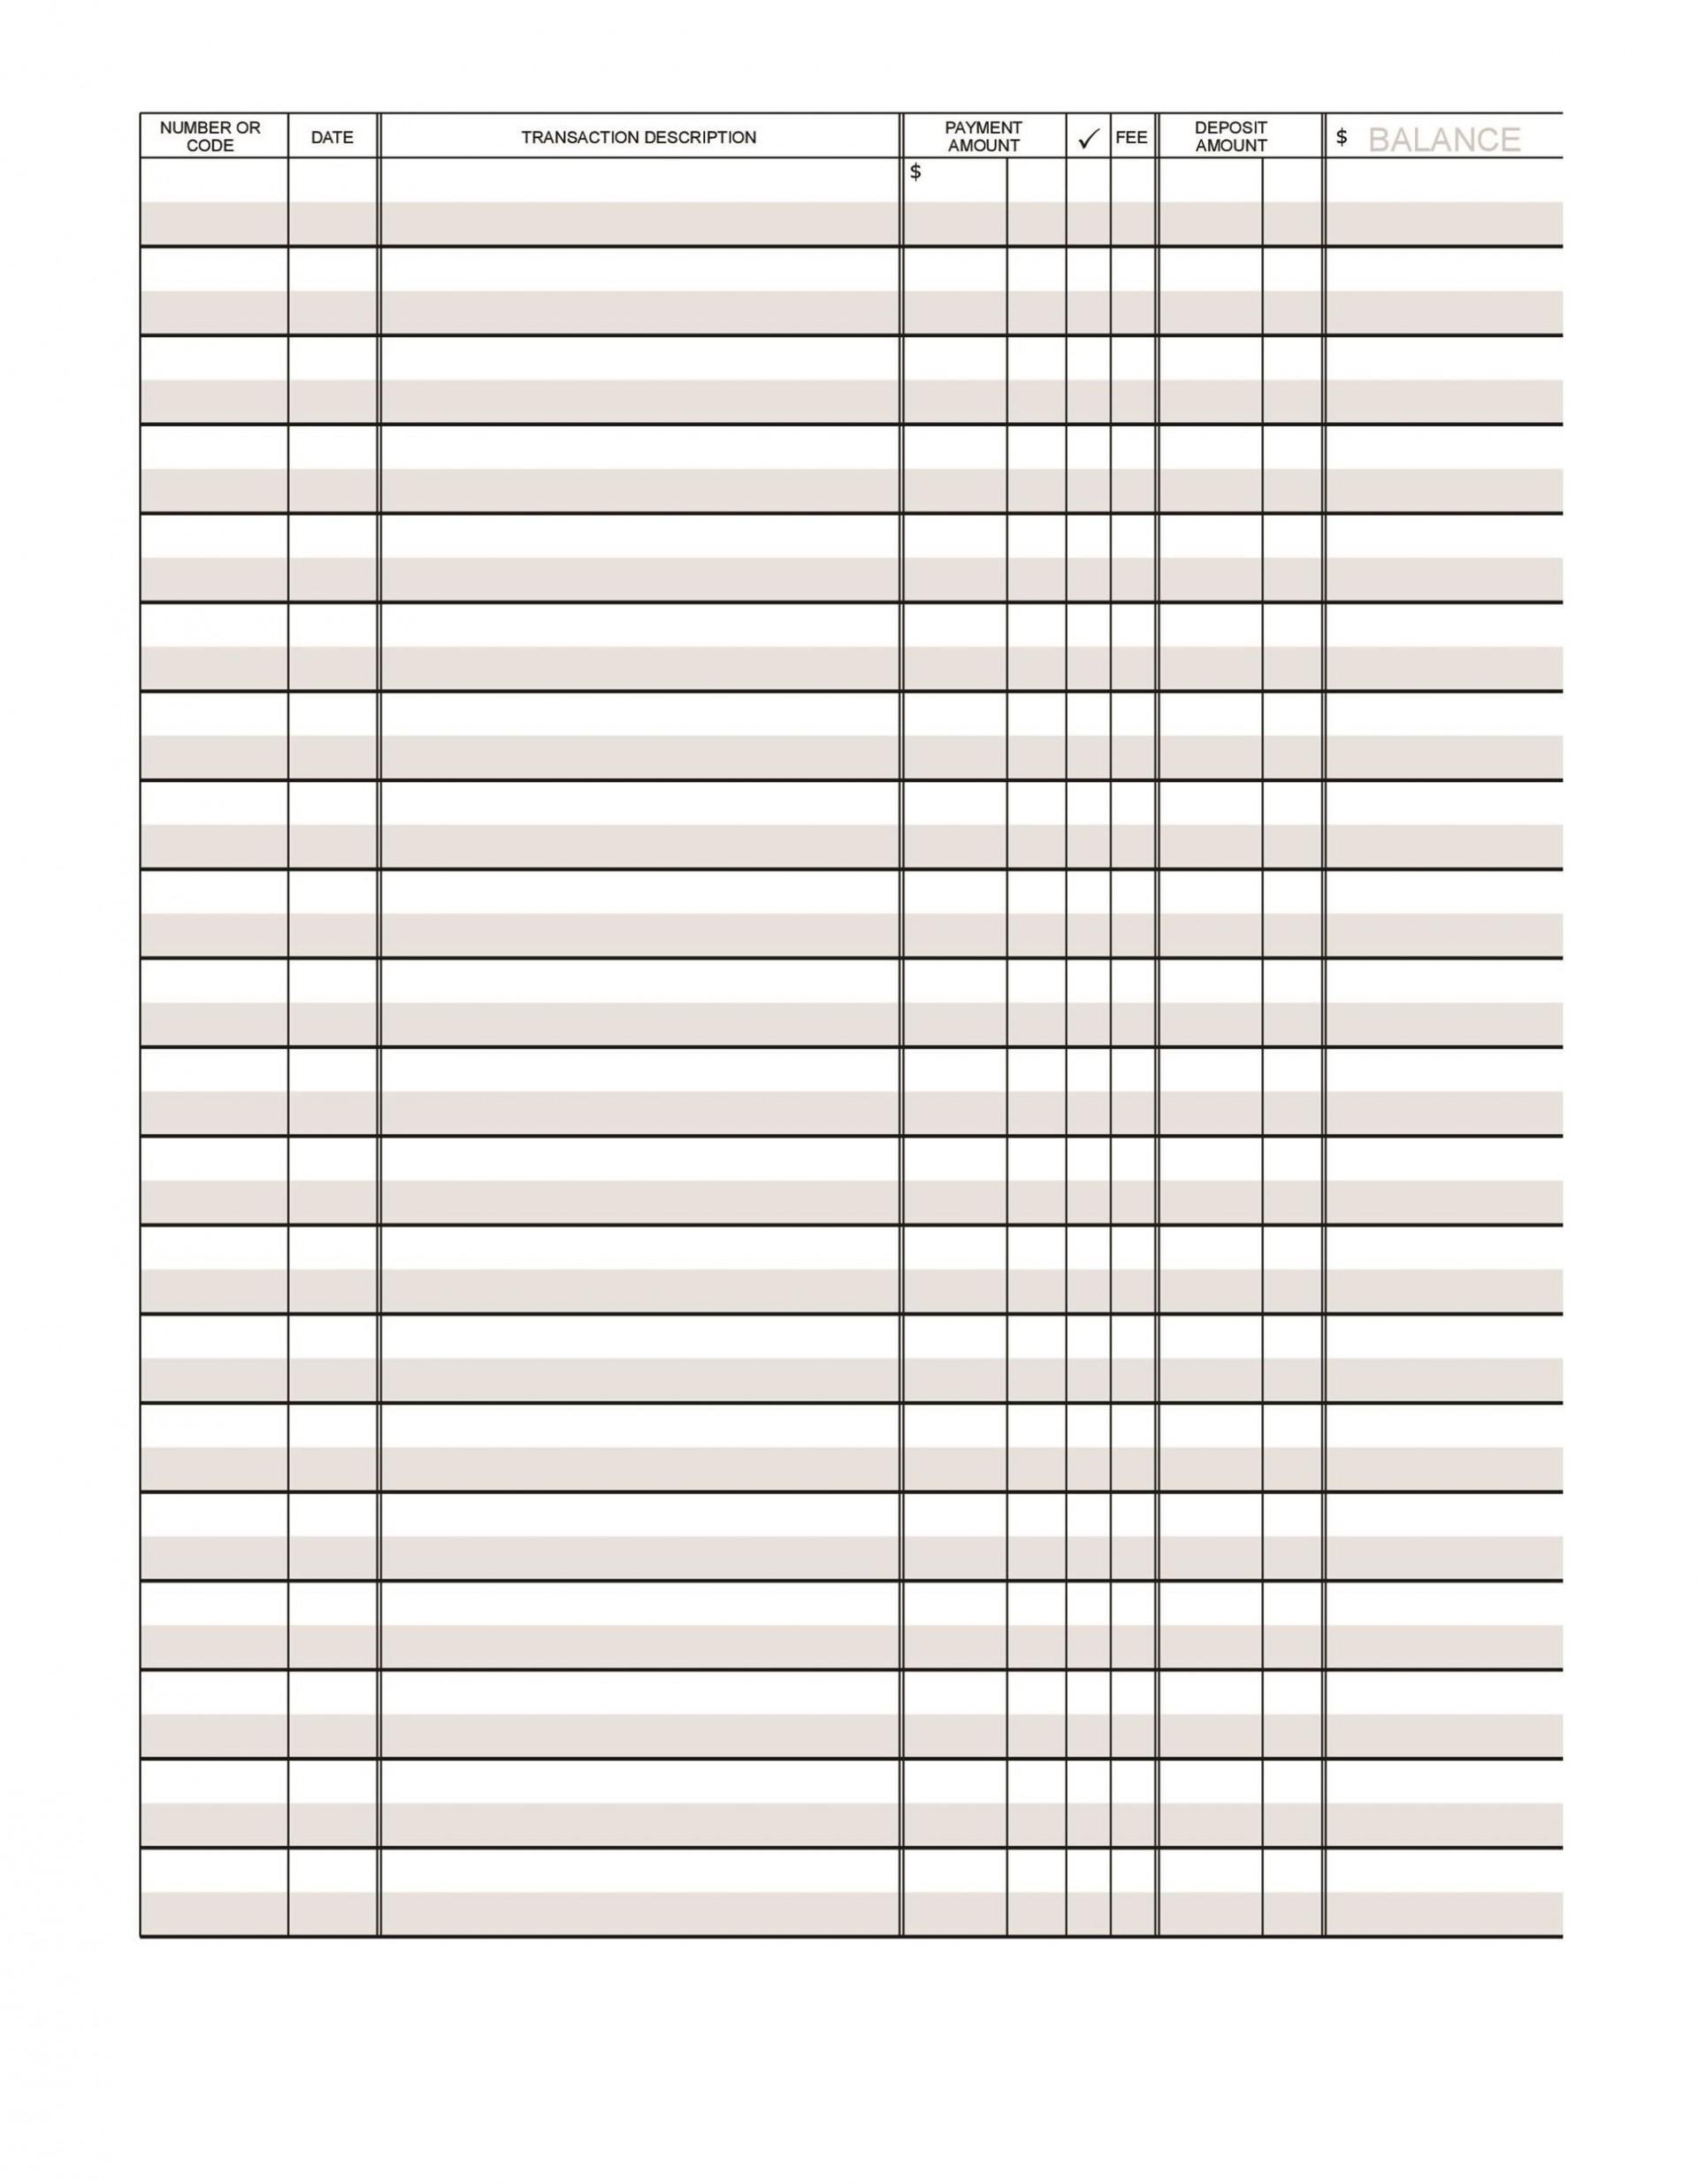 003 Impressive Check Register Template Printable Inspiration  Pdf Excel1920